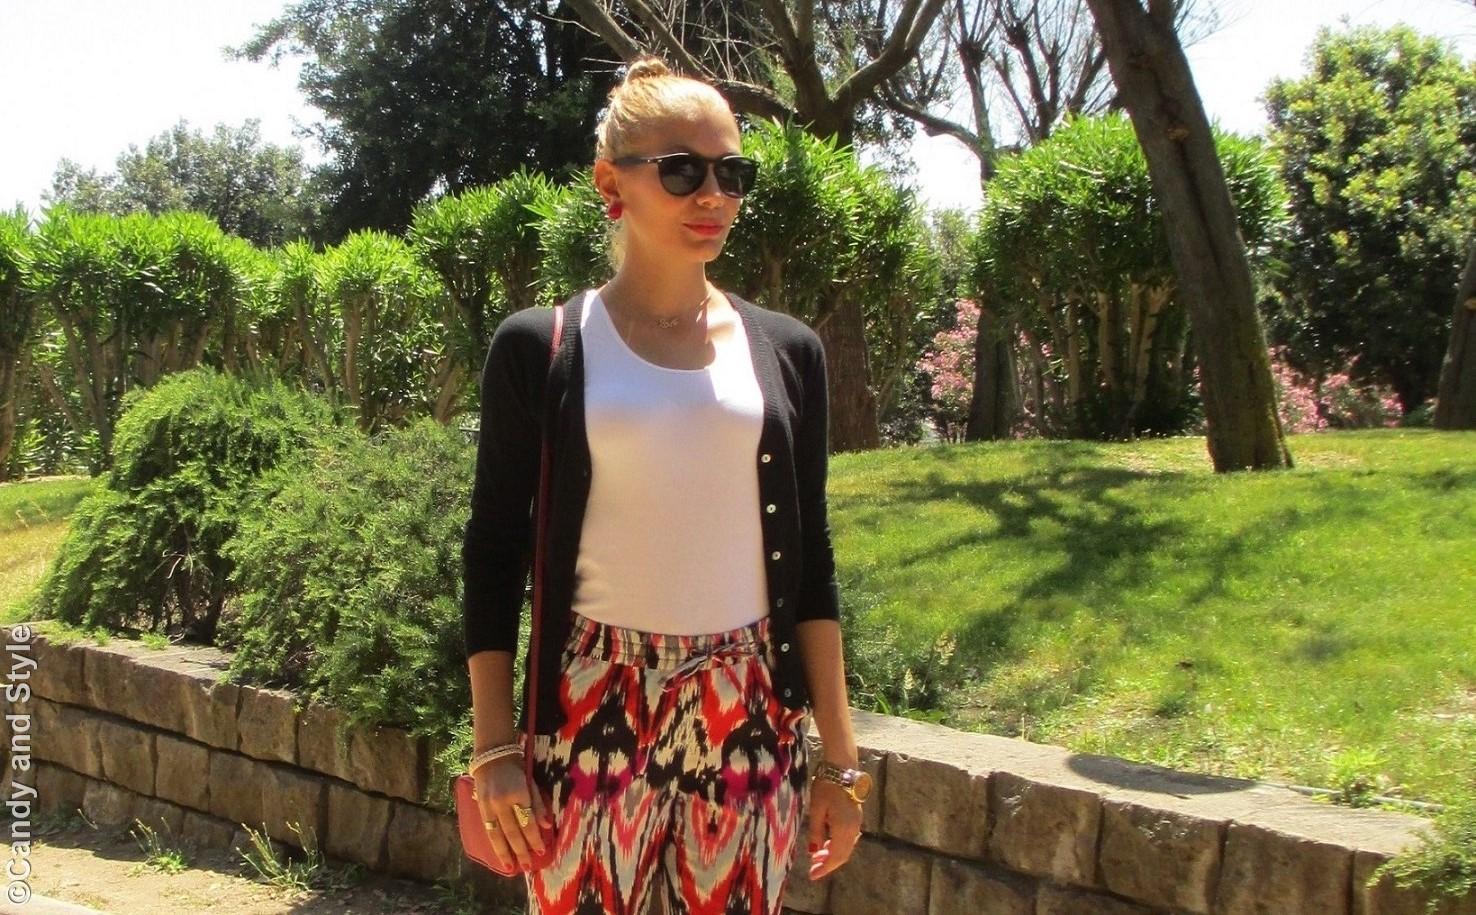 Black Cardigan, Loose Pants, Mini Bag, Excape Camo Sunglasses - Lilli Candy and Style Fashion Blog